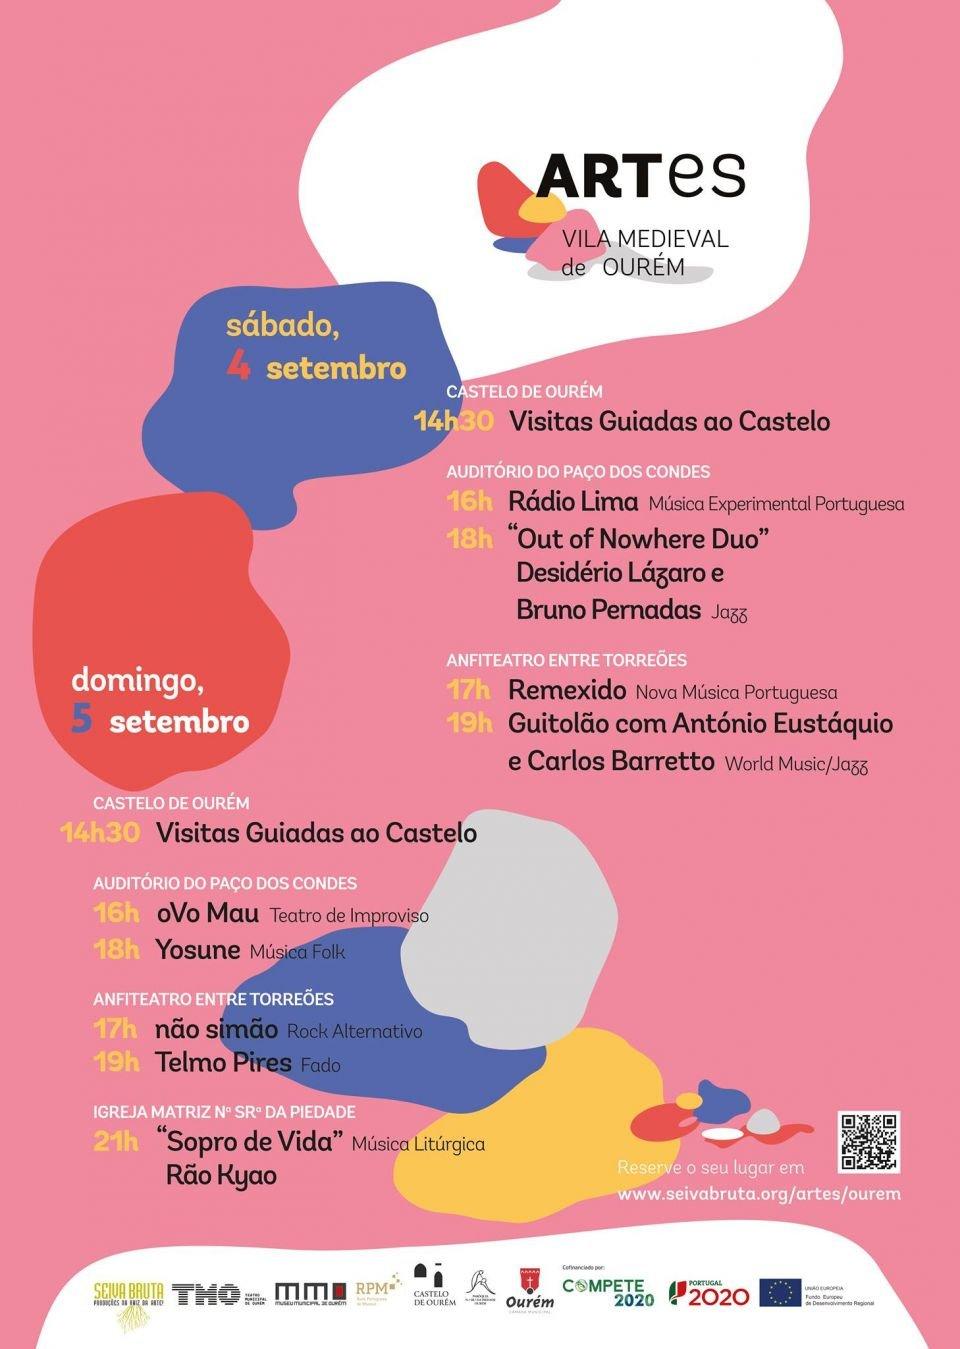 FESTIVAL ARTes -VILA MEDIEVAL DE OURÉM   'YOSUNE' Música Folk